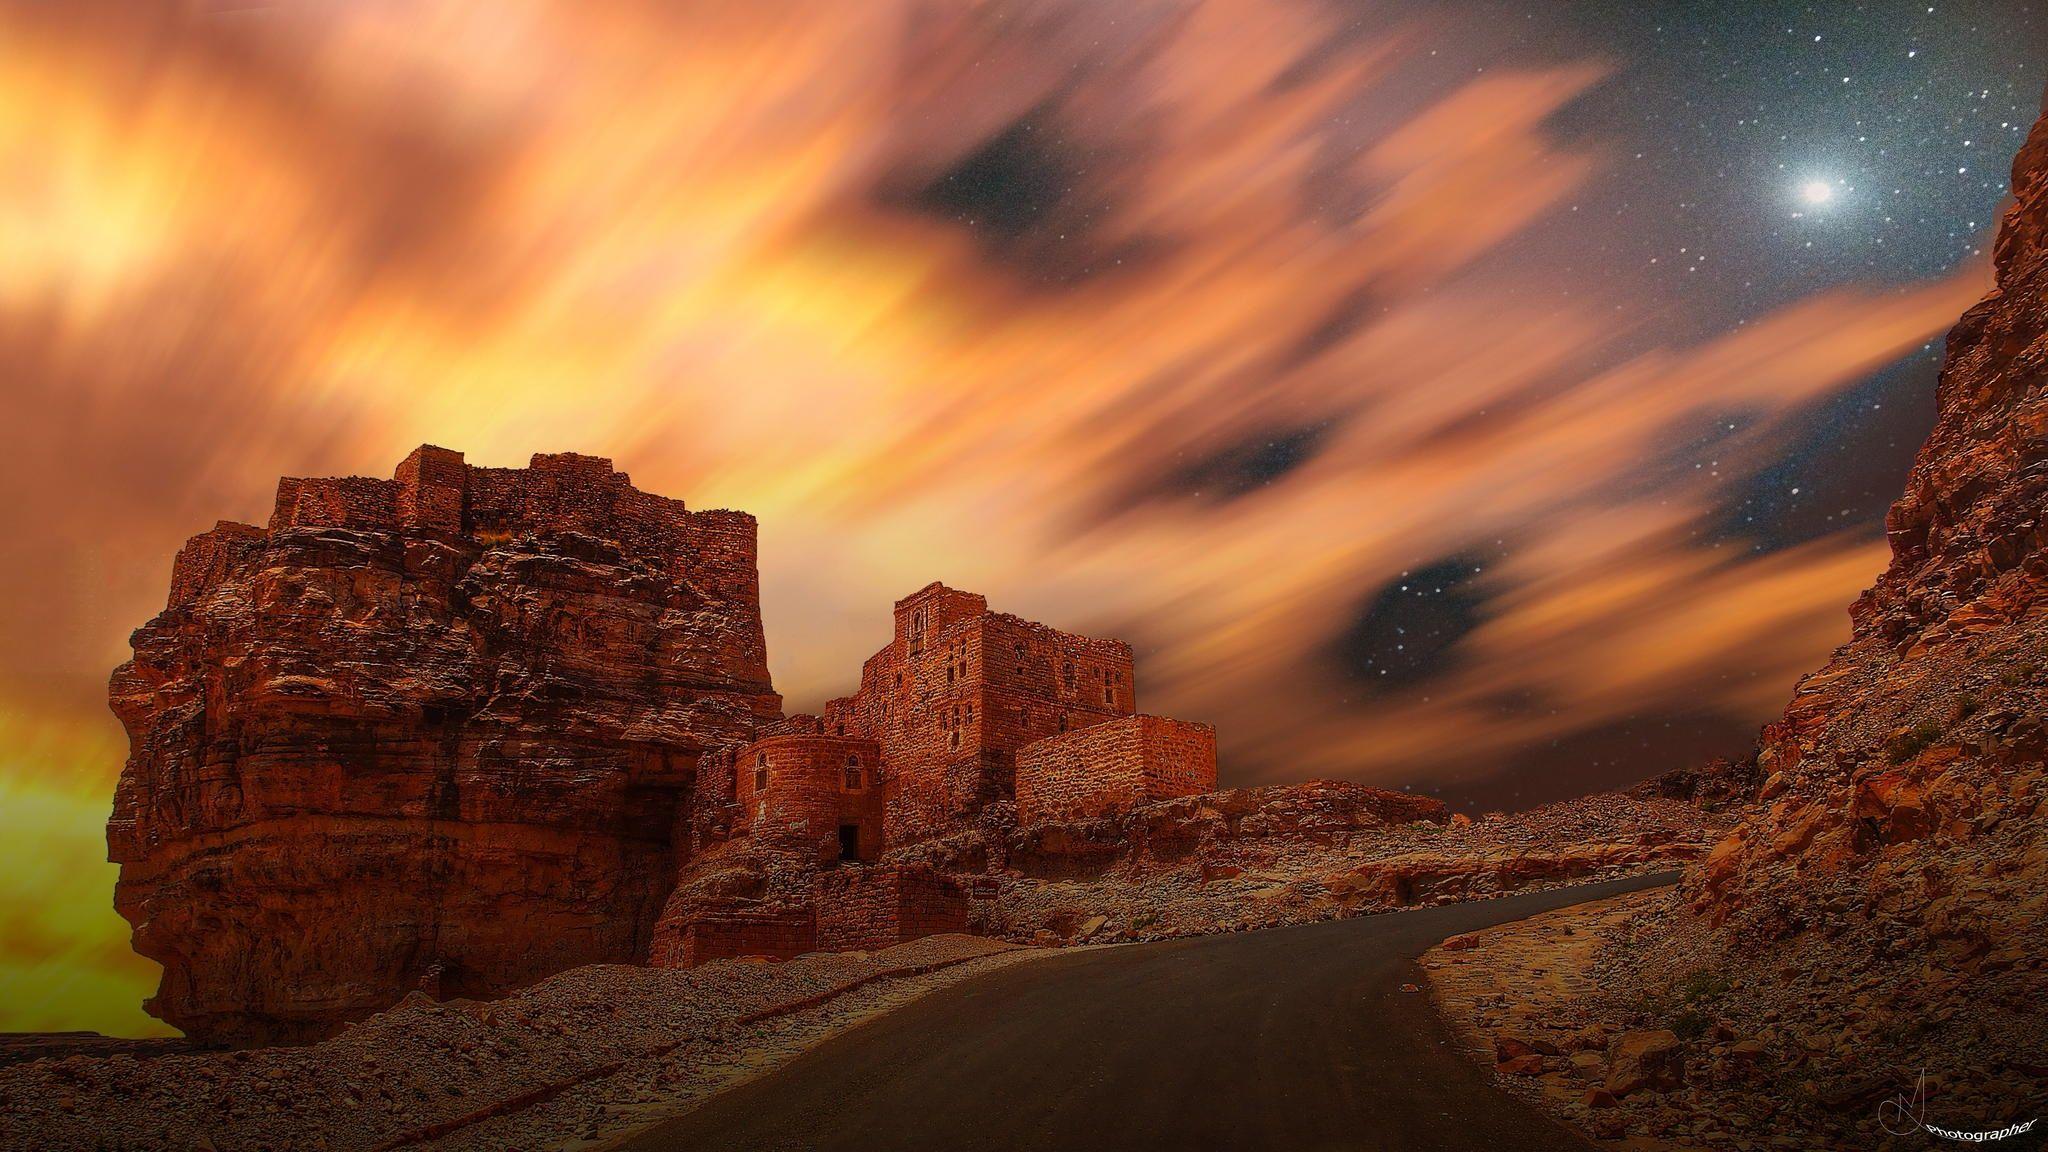 Al Zakati Castle | Discovered from Dream Afar New Tab